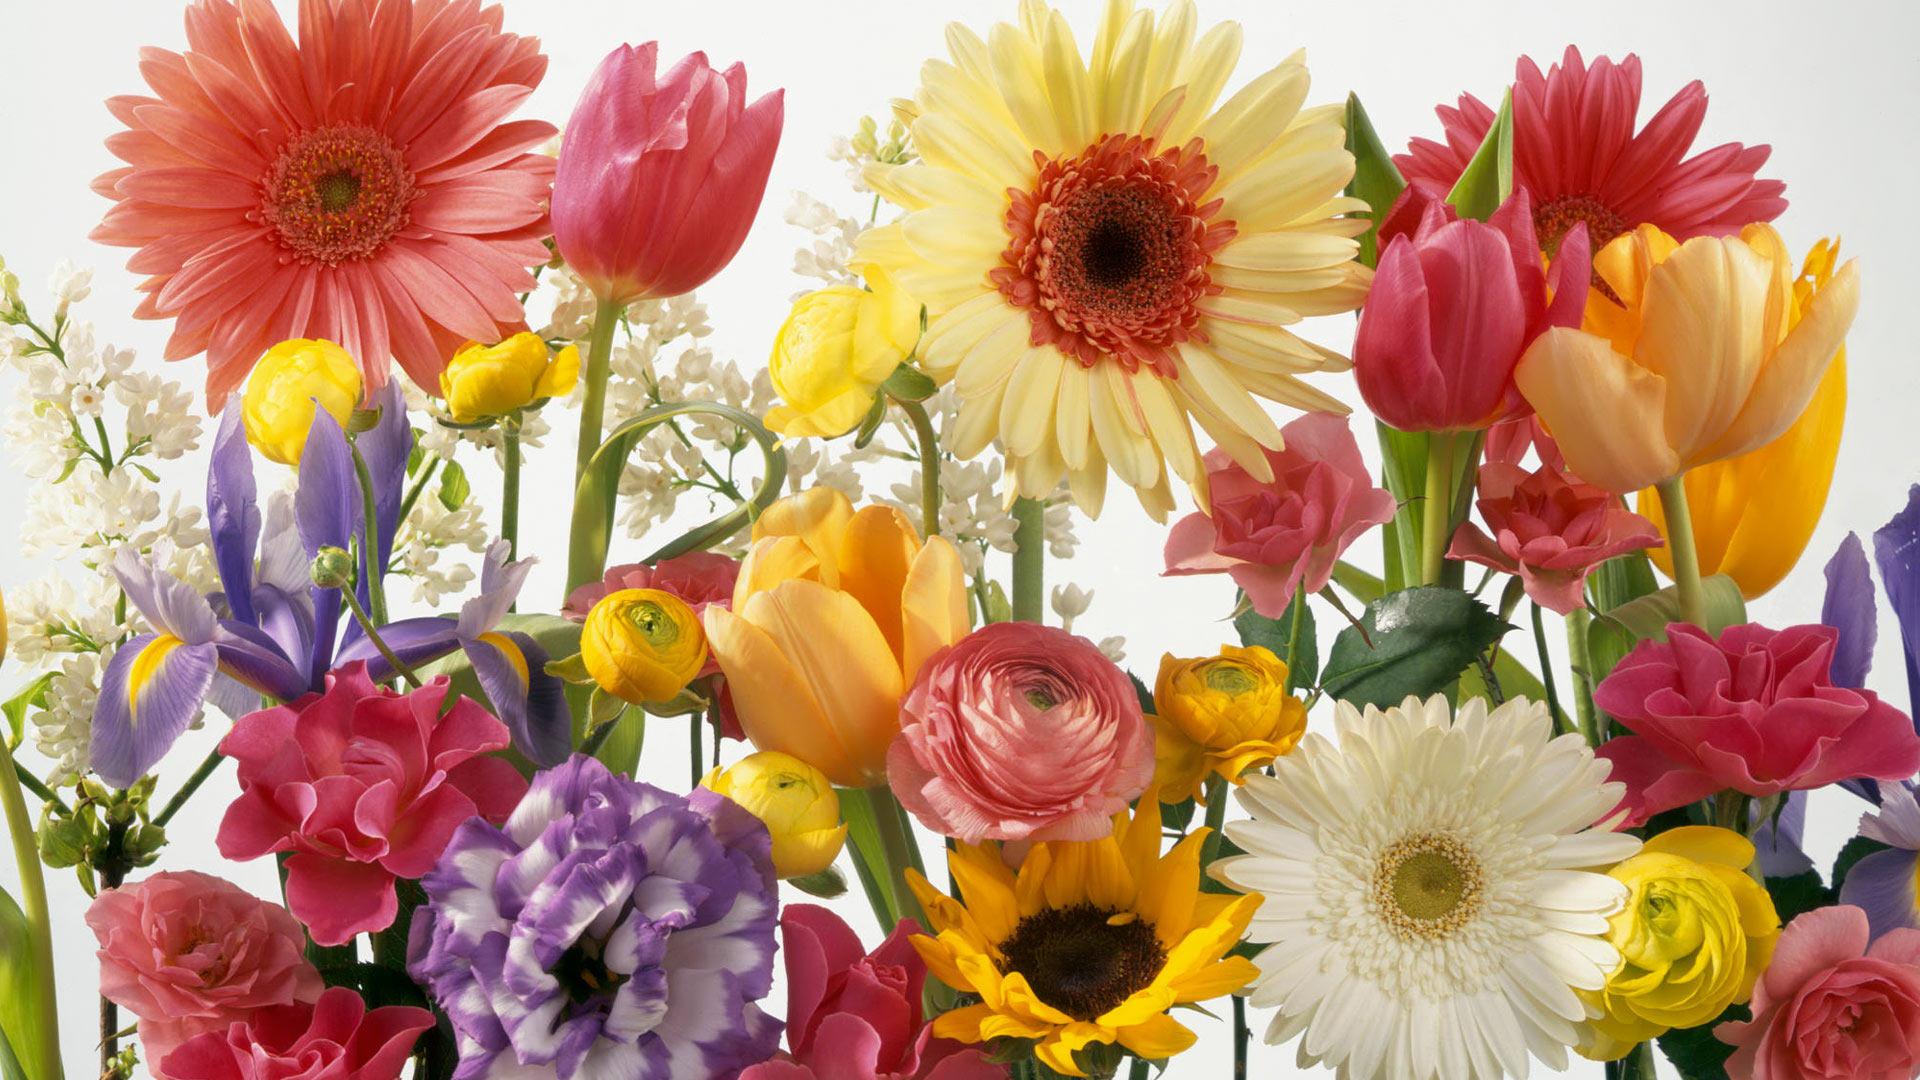 Desktop Wallpaper Spring Flowers 1920x1080